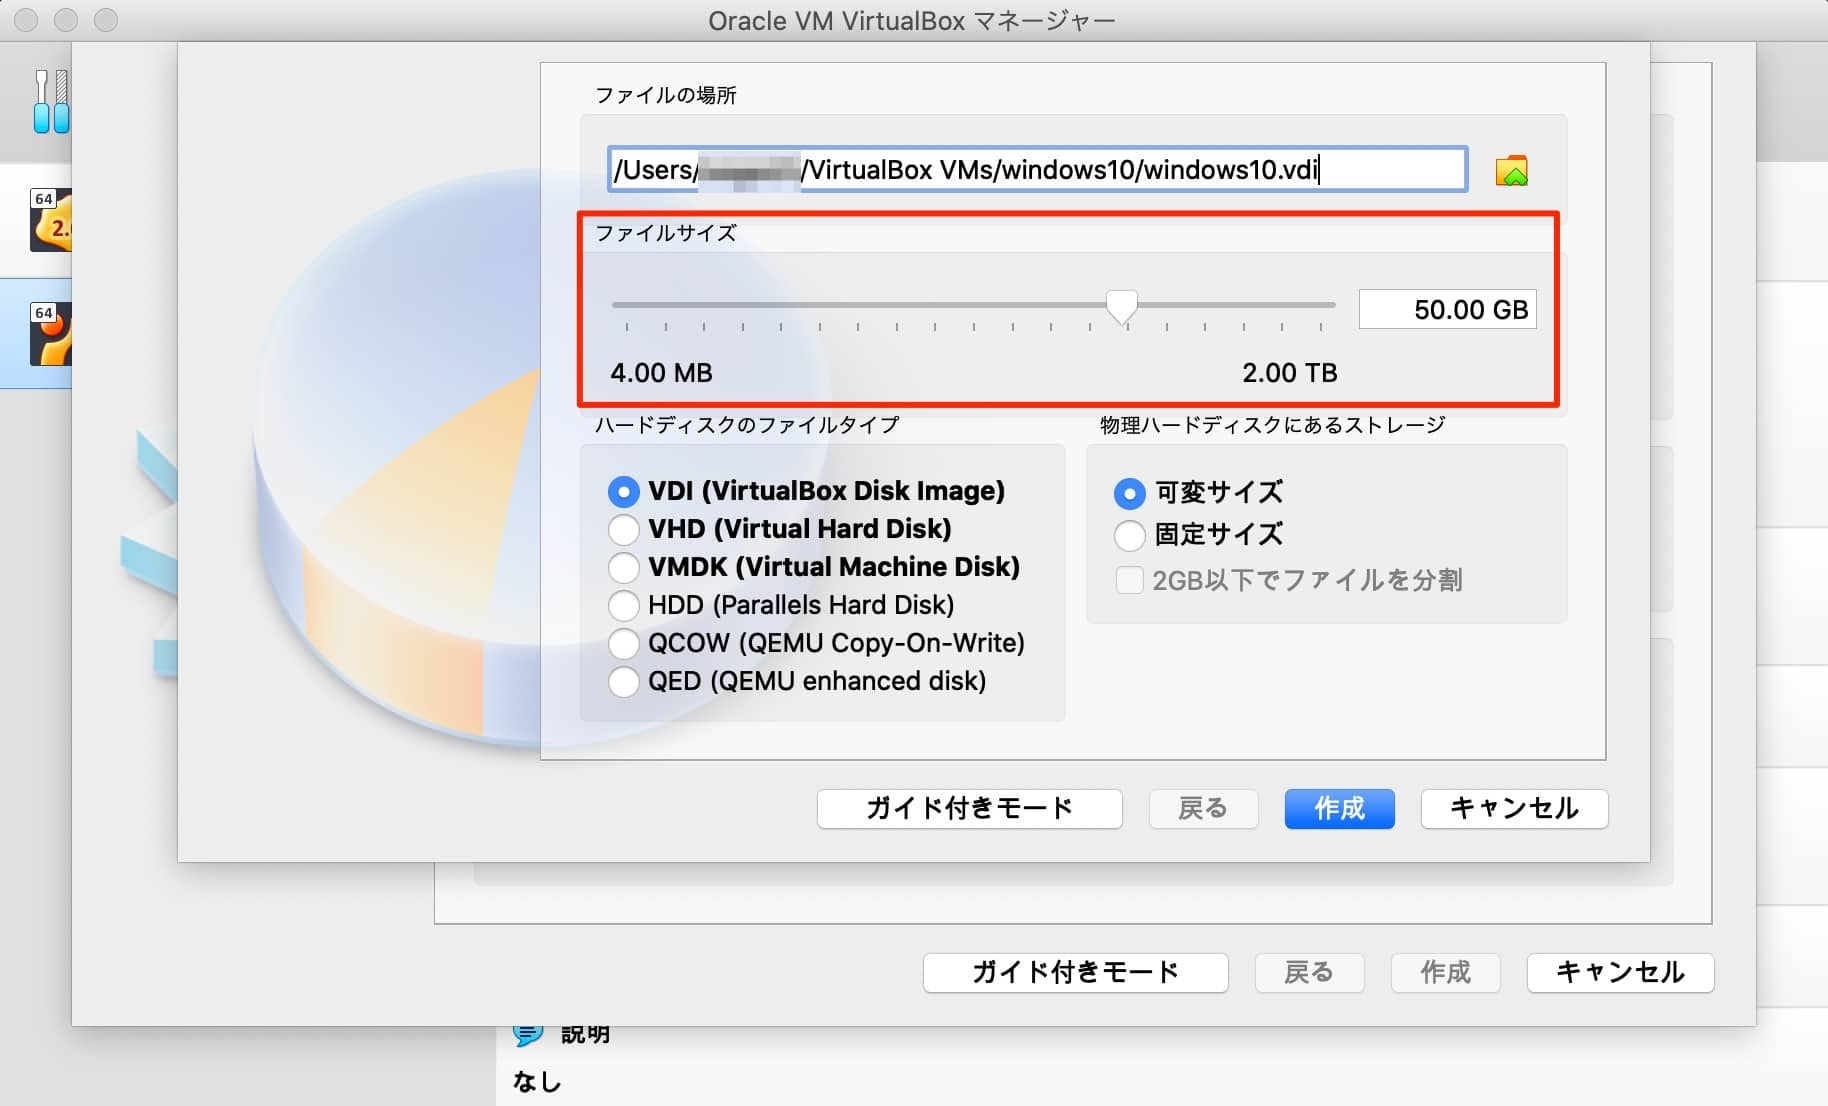 windows10のファイルサイズを選択